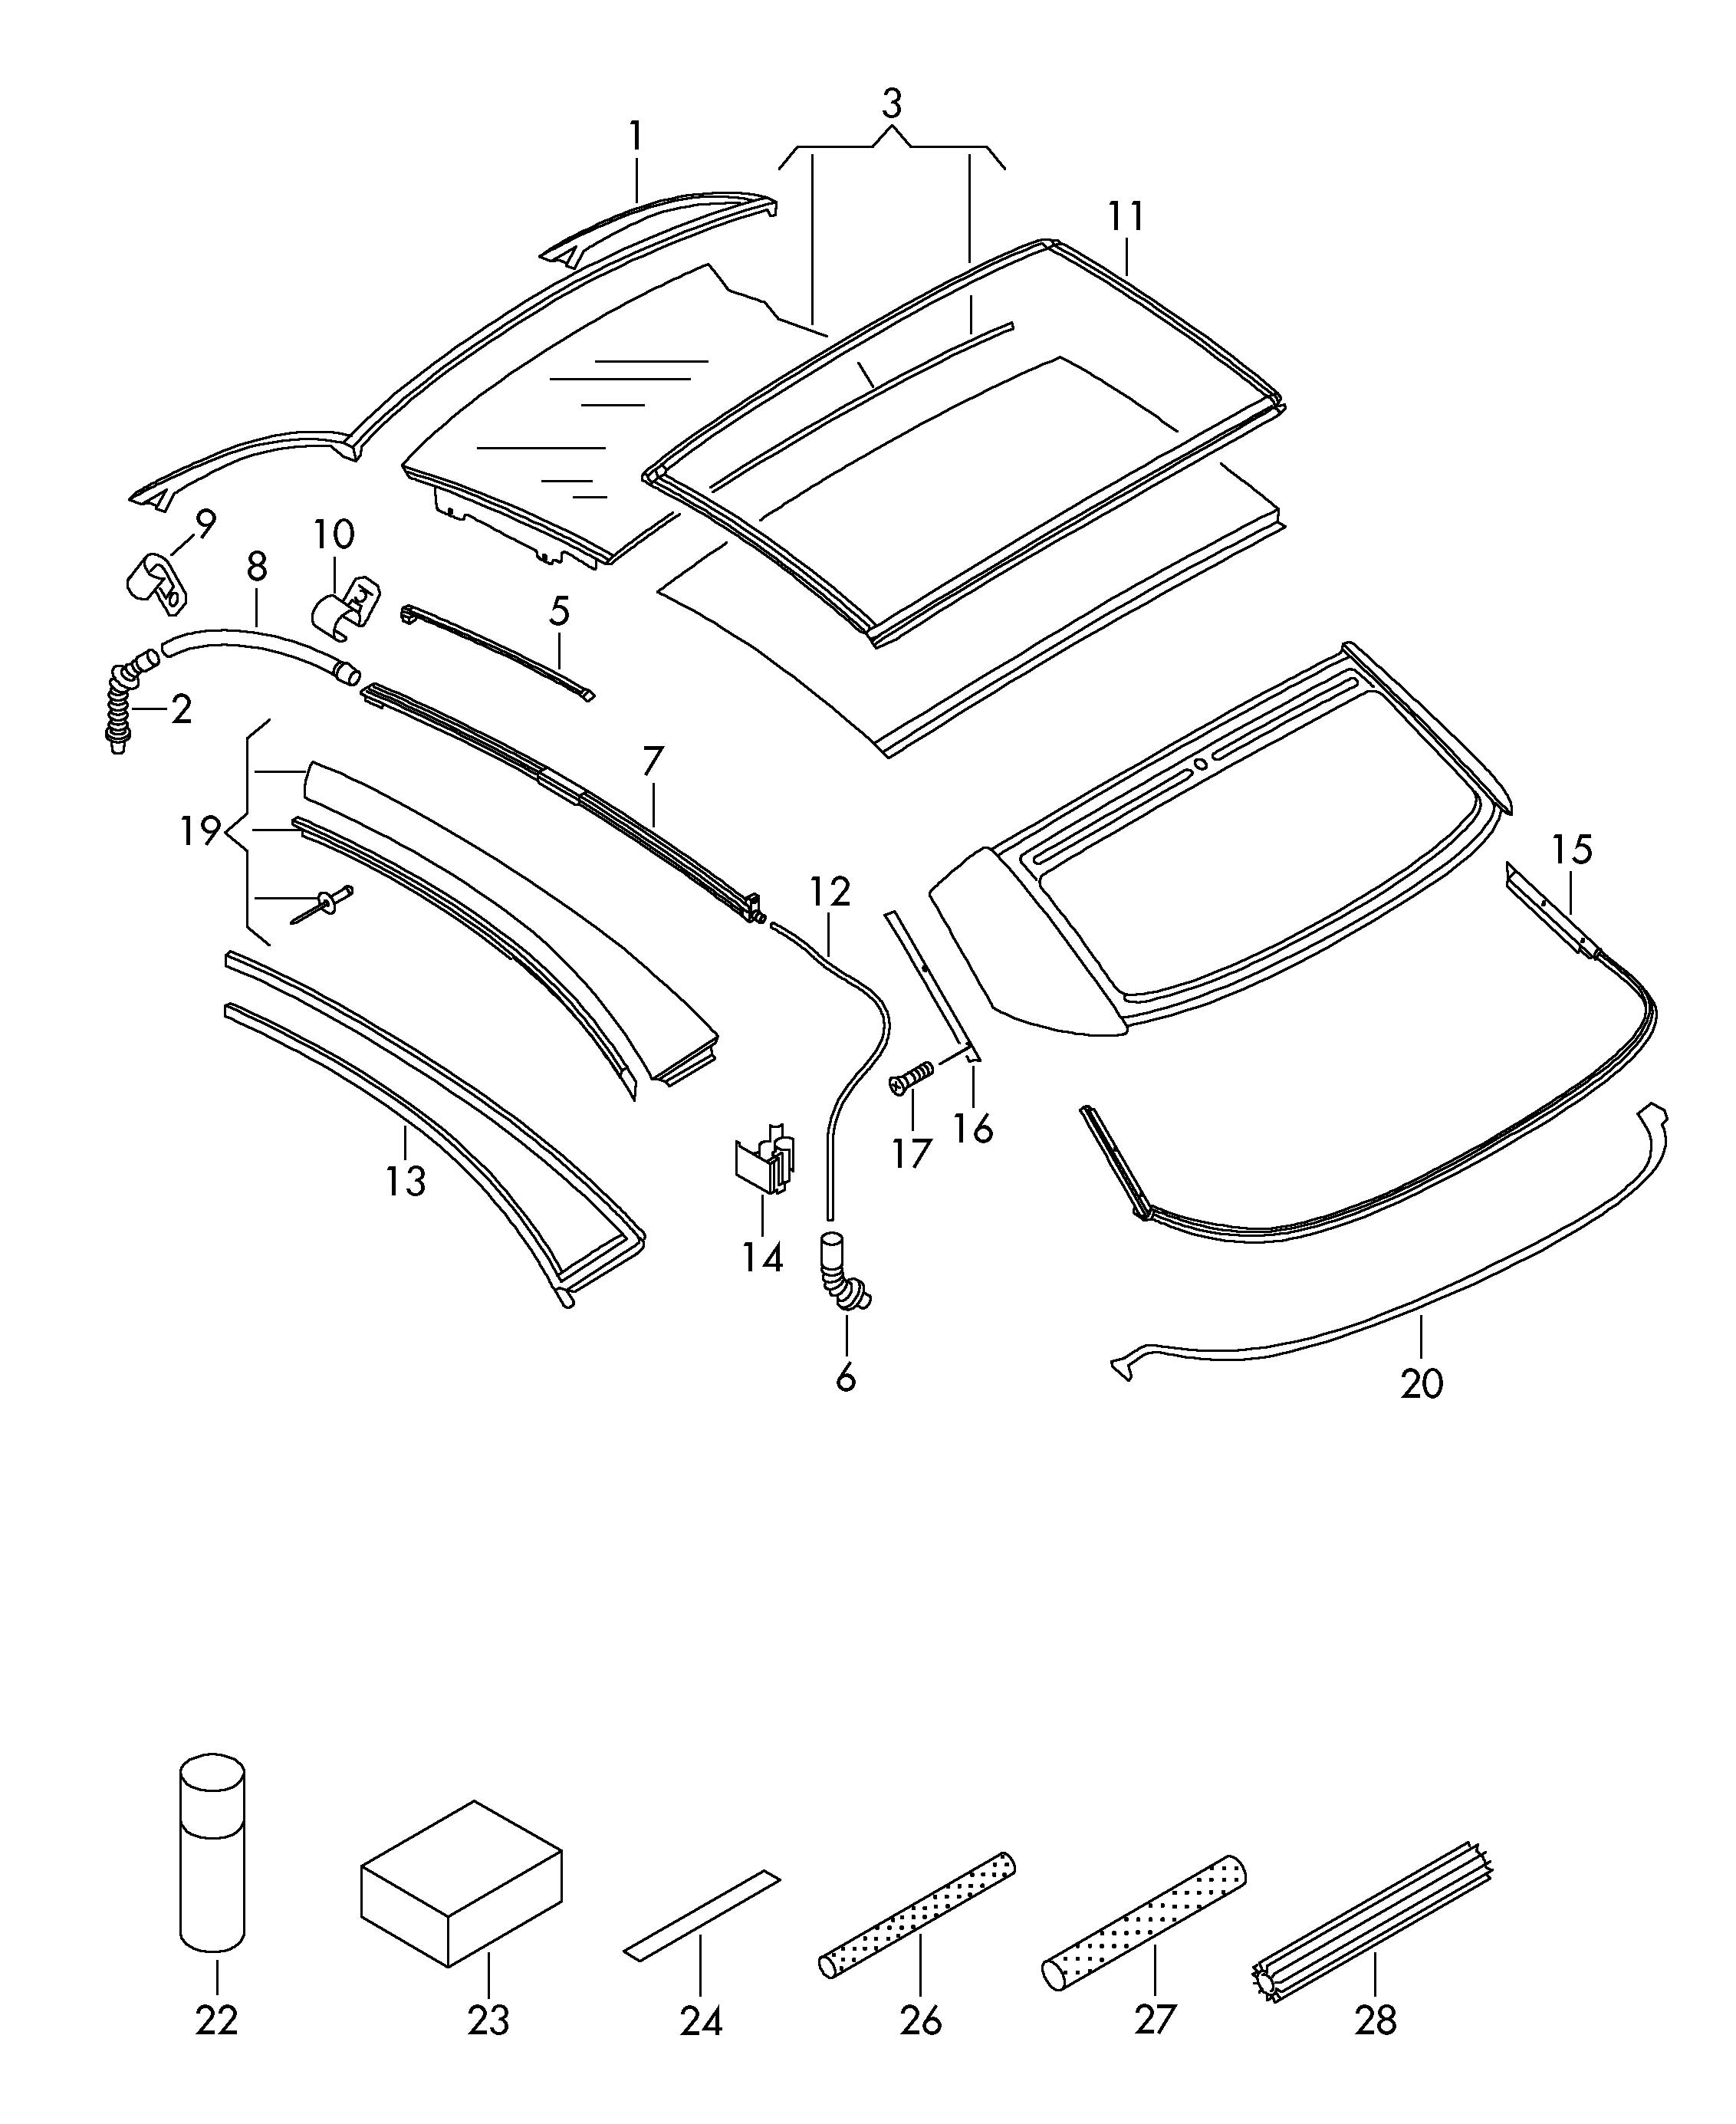 vw eos parts diagram 2004 ford f150 fx4 radio wiring fuse for 2008 library description 482871200 box